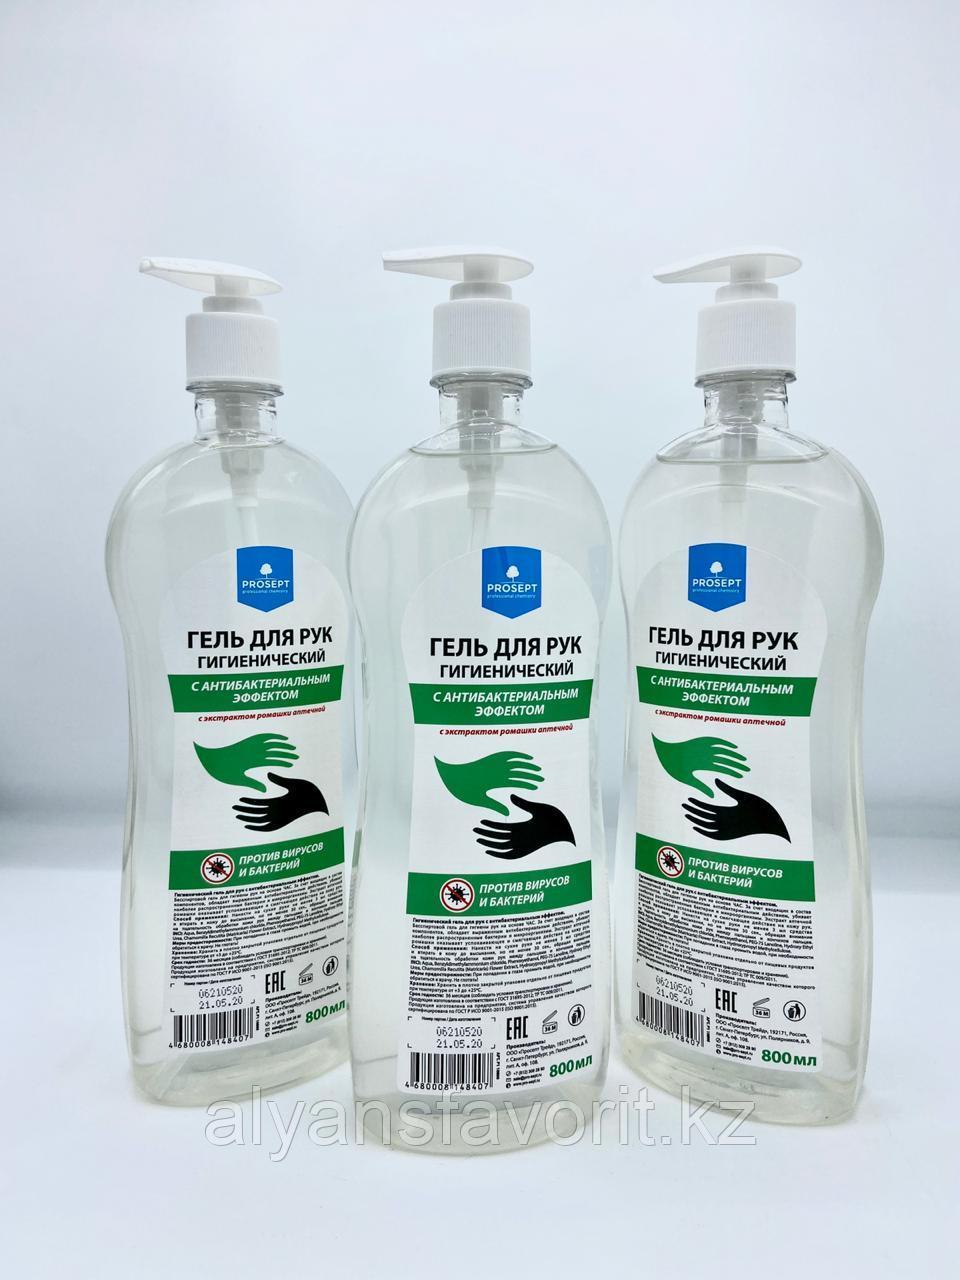 PROSEPT- антисептик (санитайзер)  гель для рук 800  мл. РФ